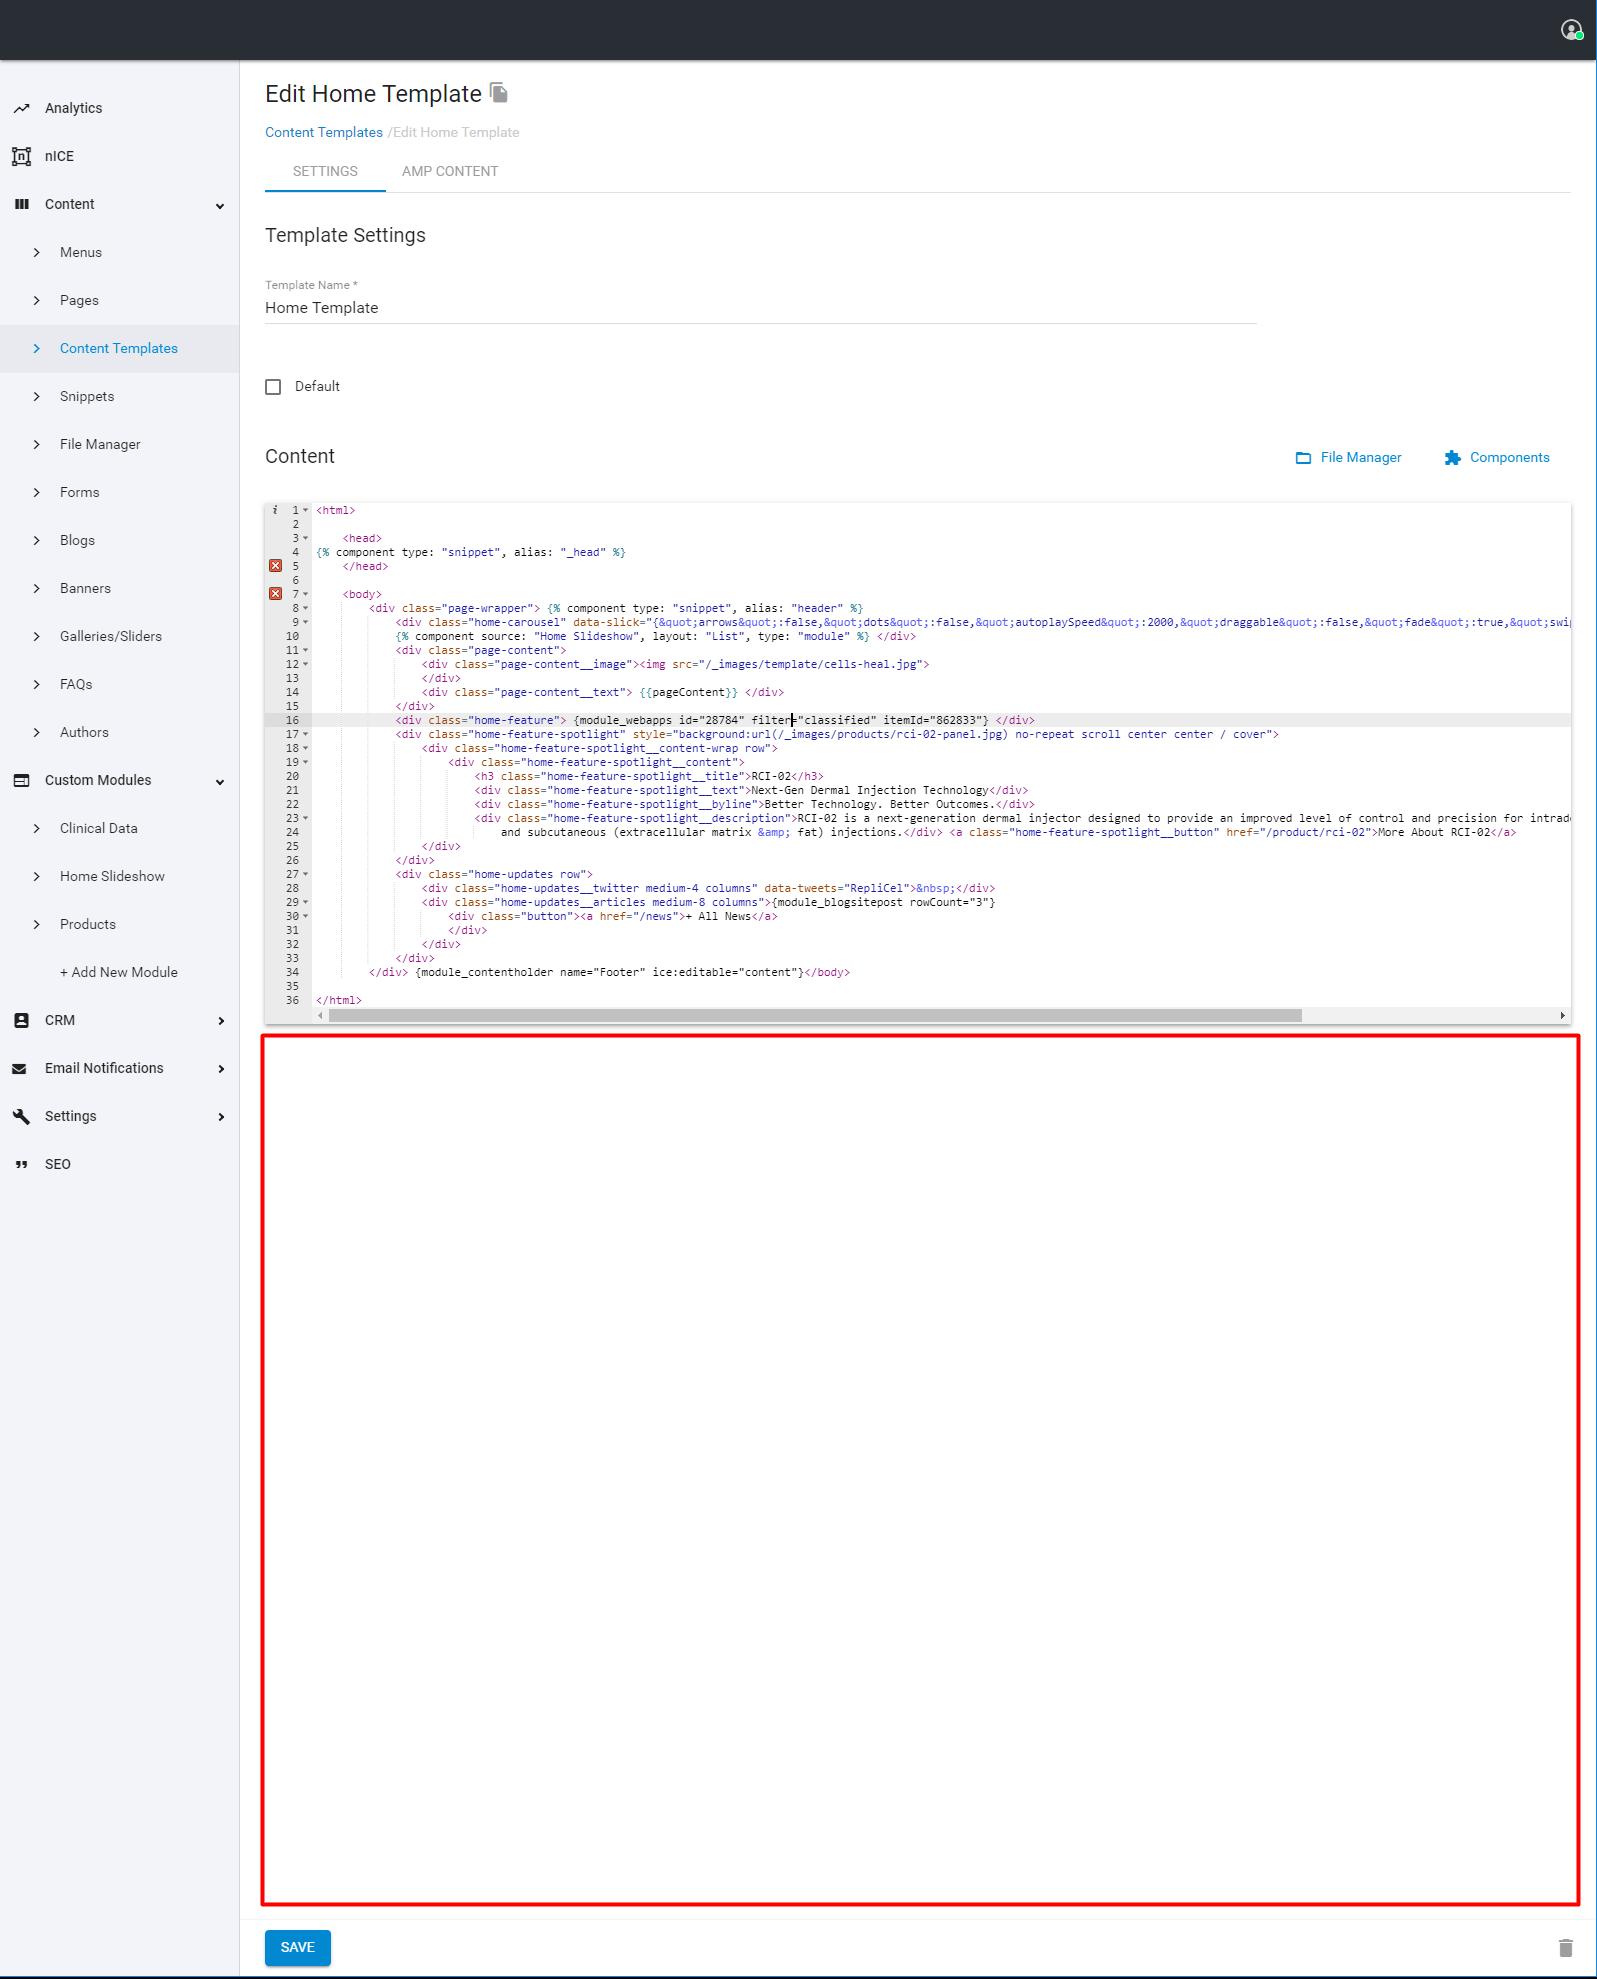 editing-window.png